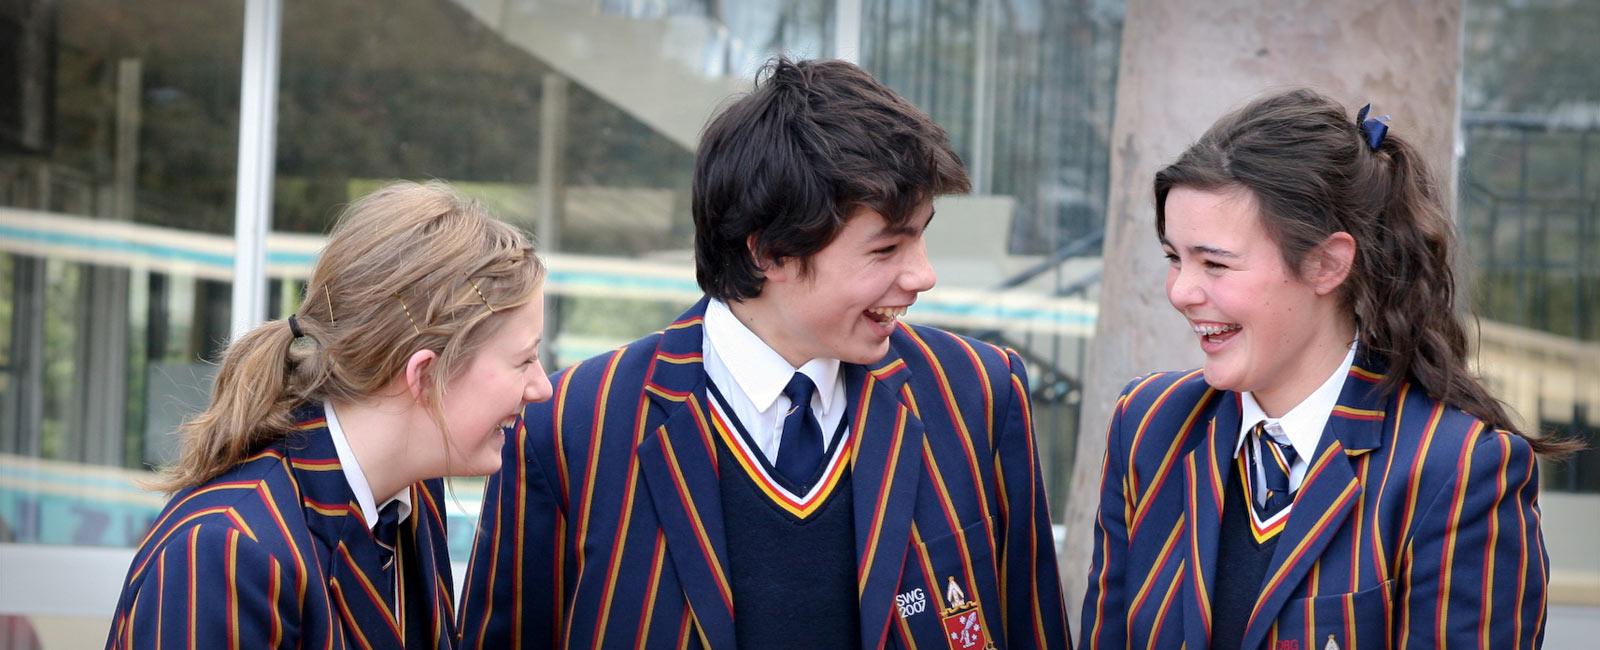 Schuluniform in Australien